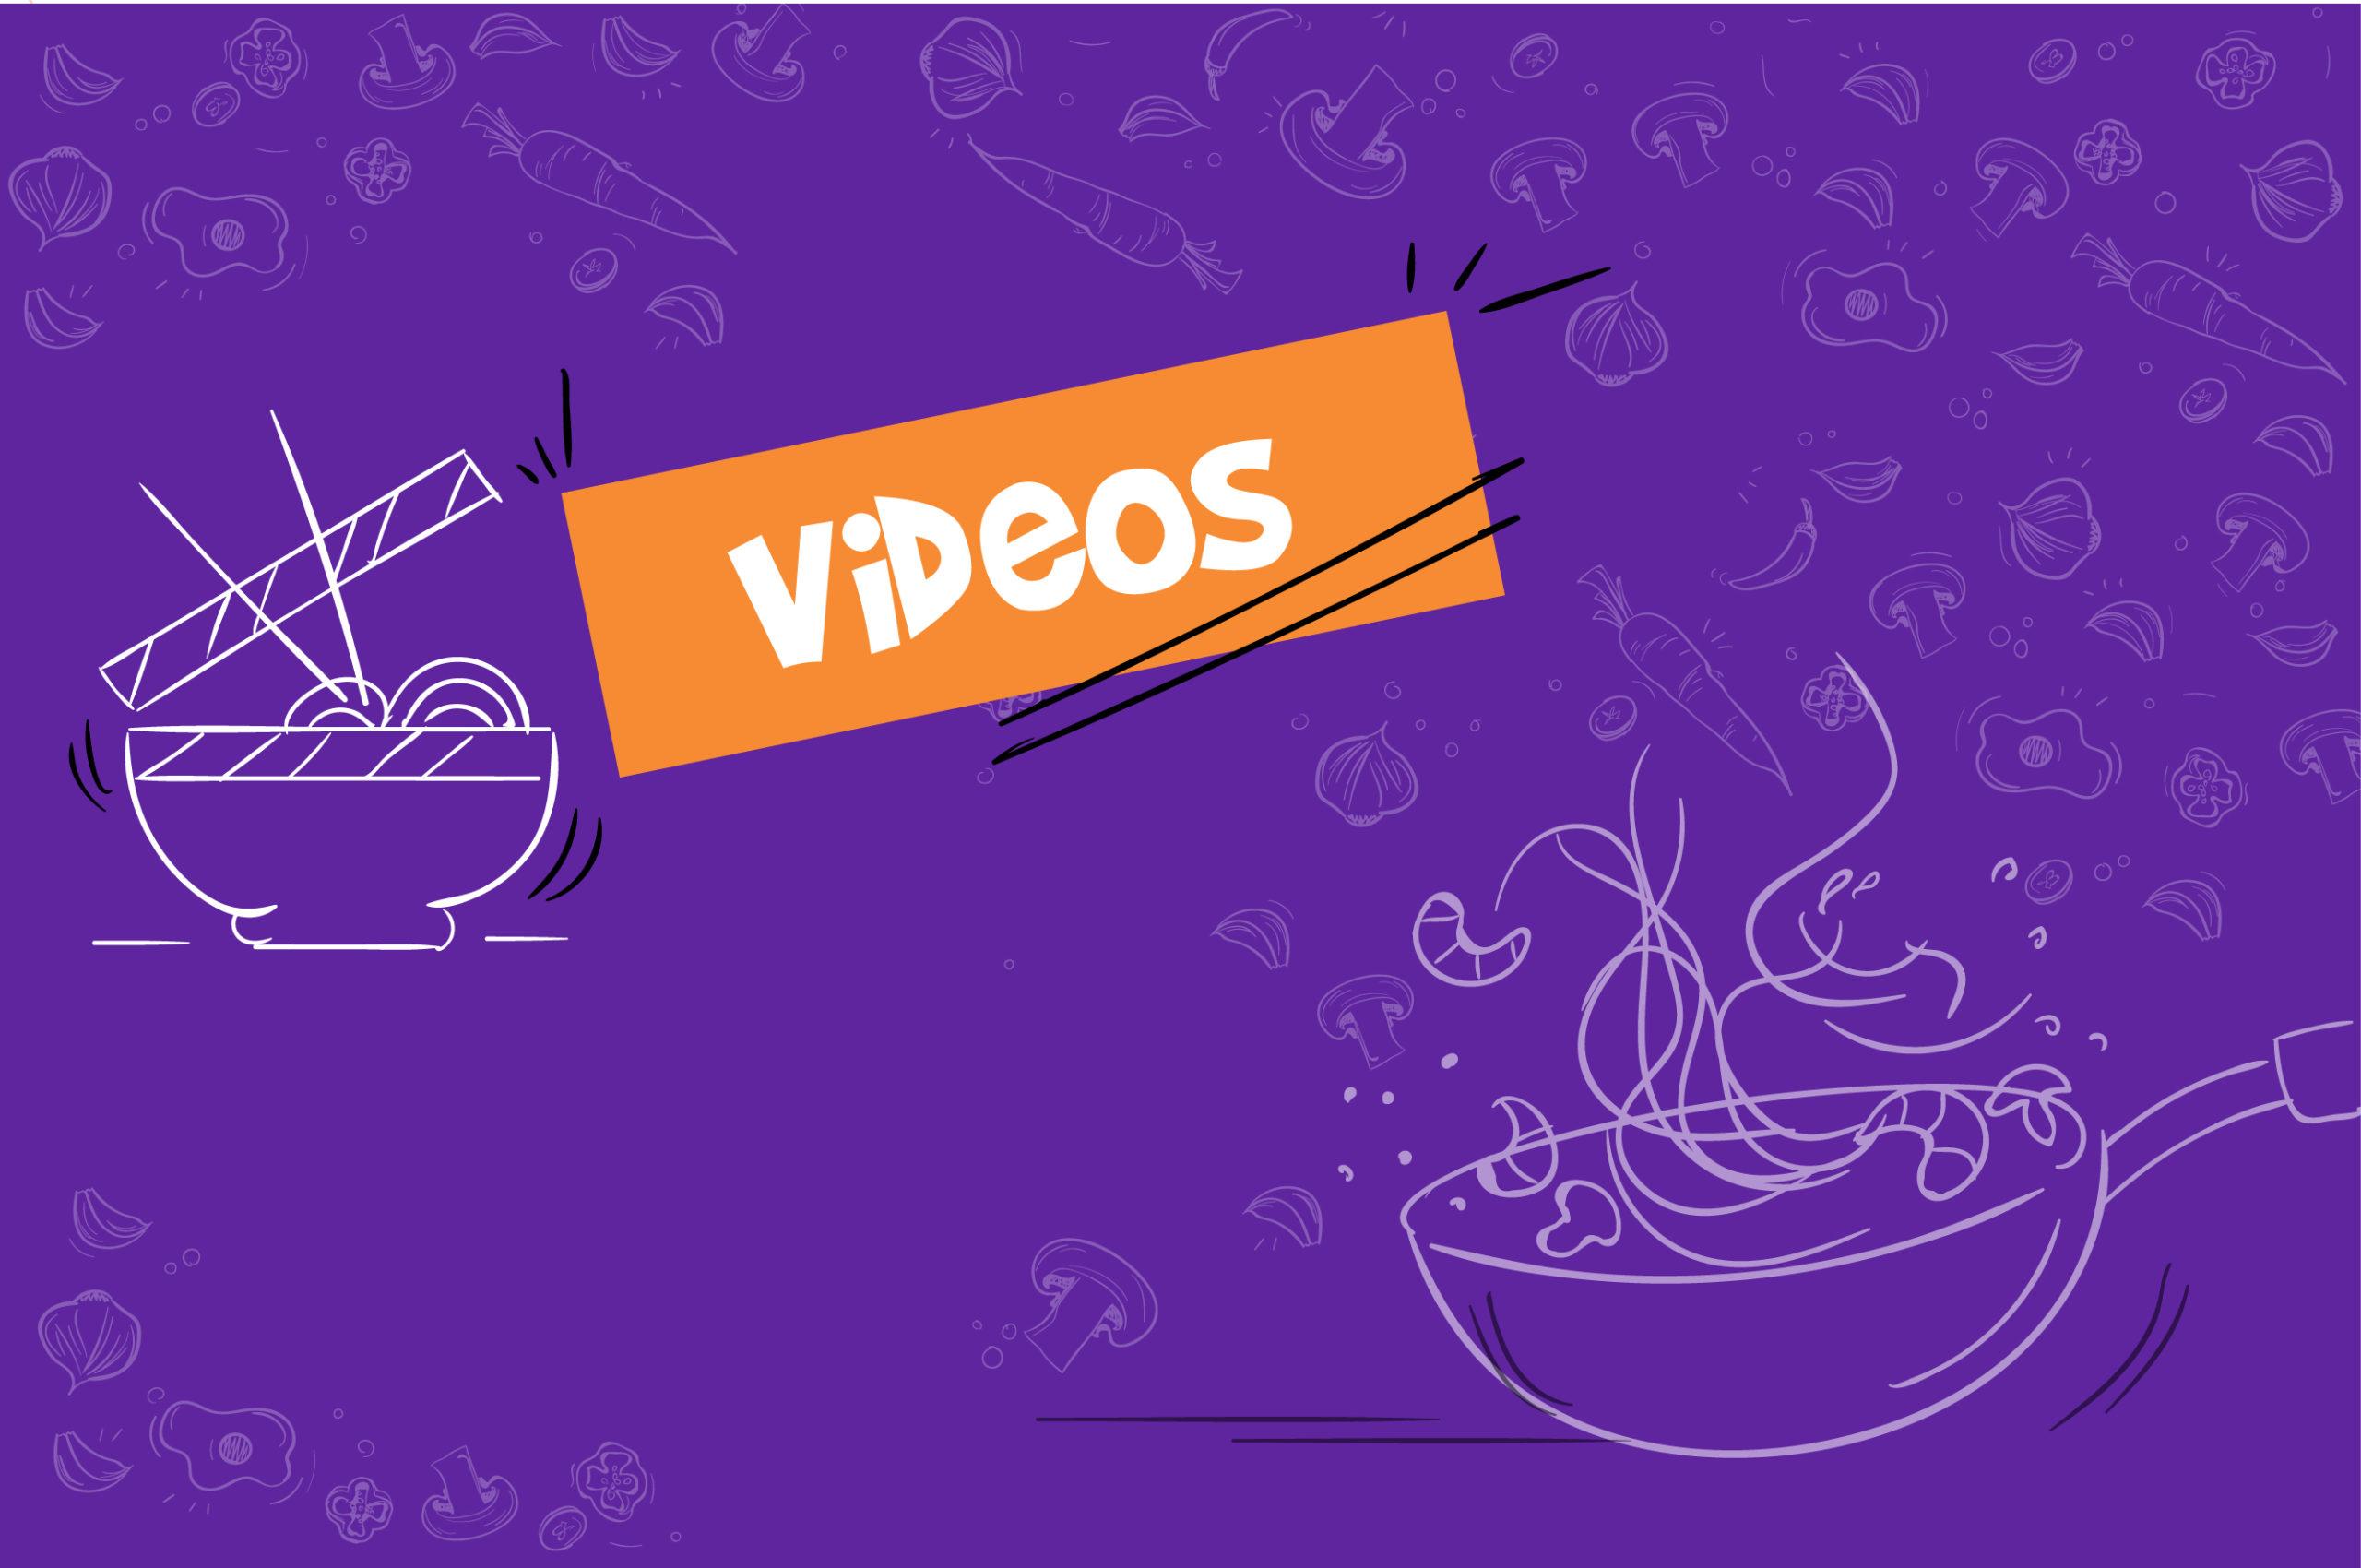 yippee! videos